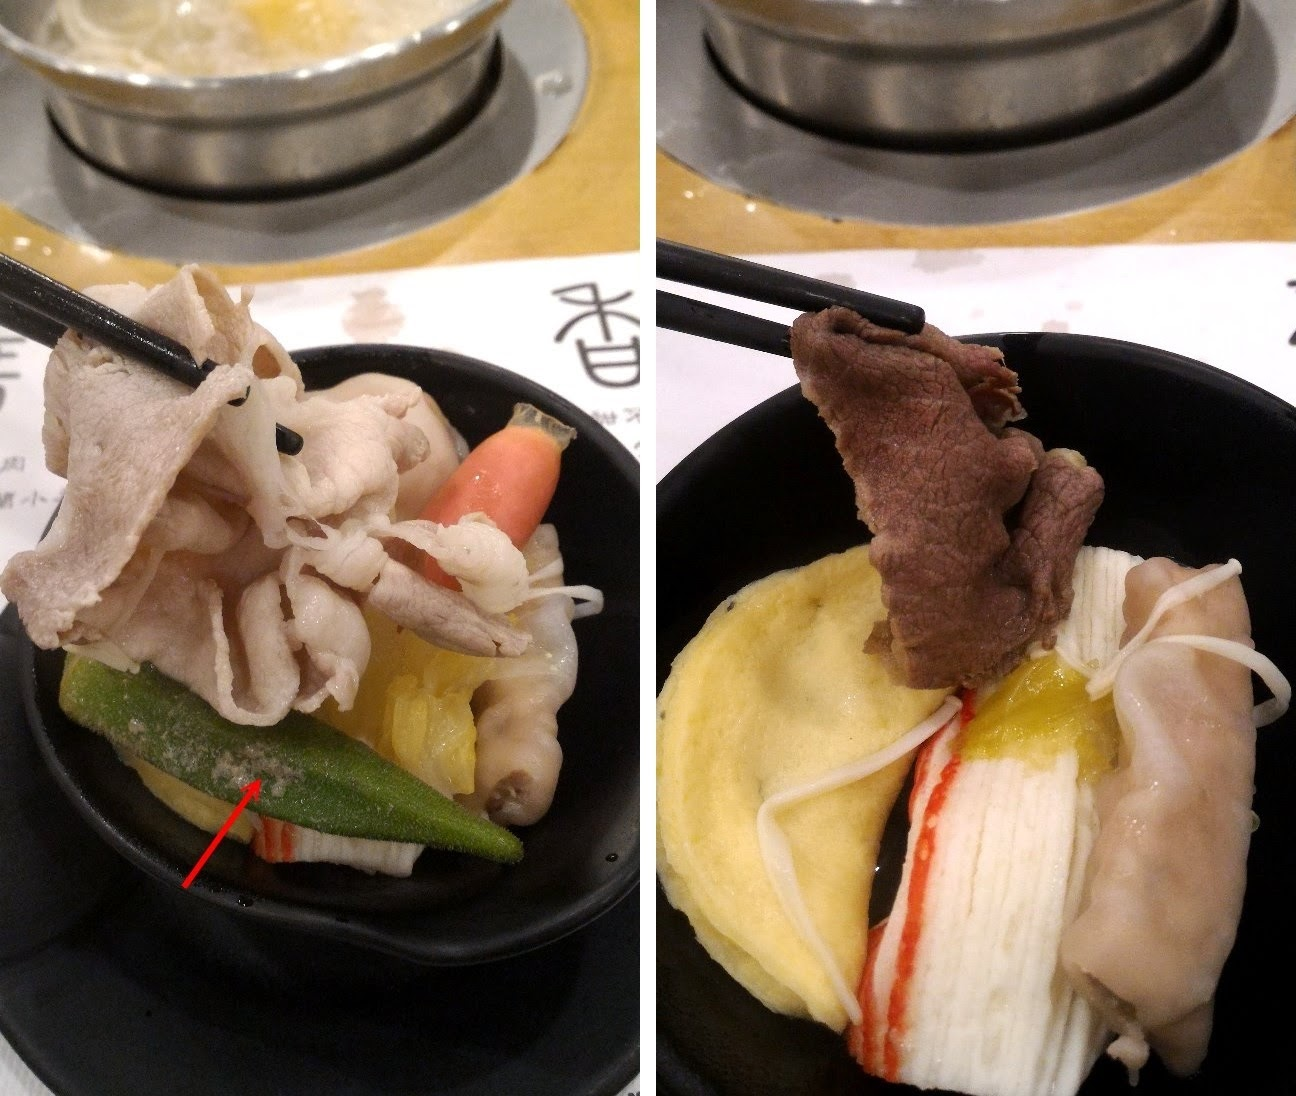 P 20160725 182629 - [食記] 廣香吃到飽日式涮涮鍋,超多種飲料、冰品及甜點!